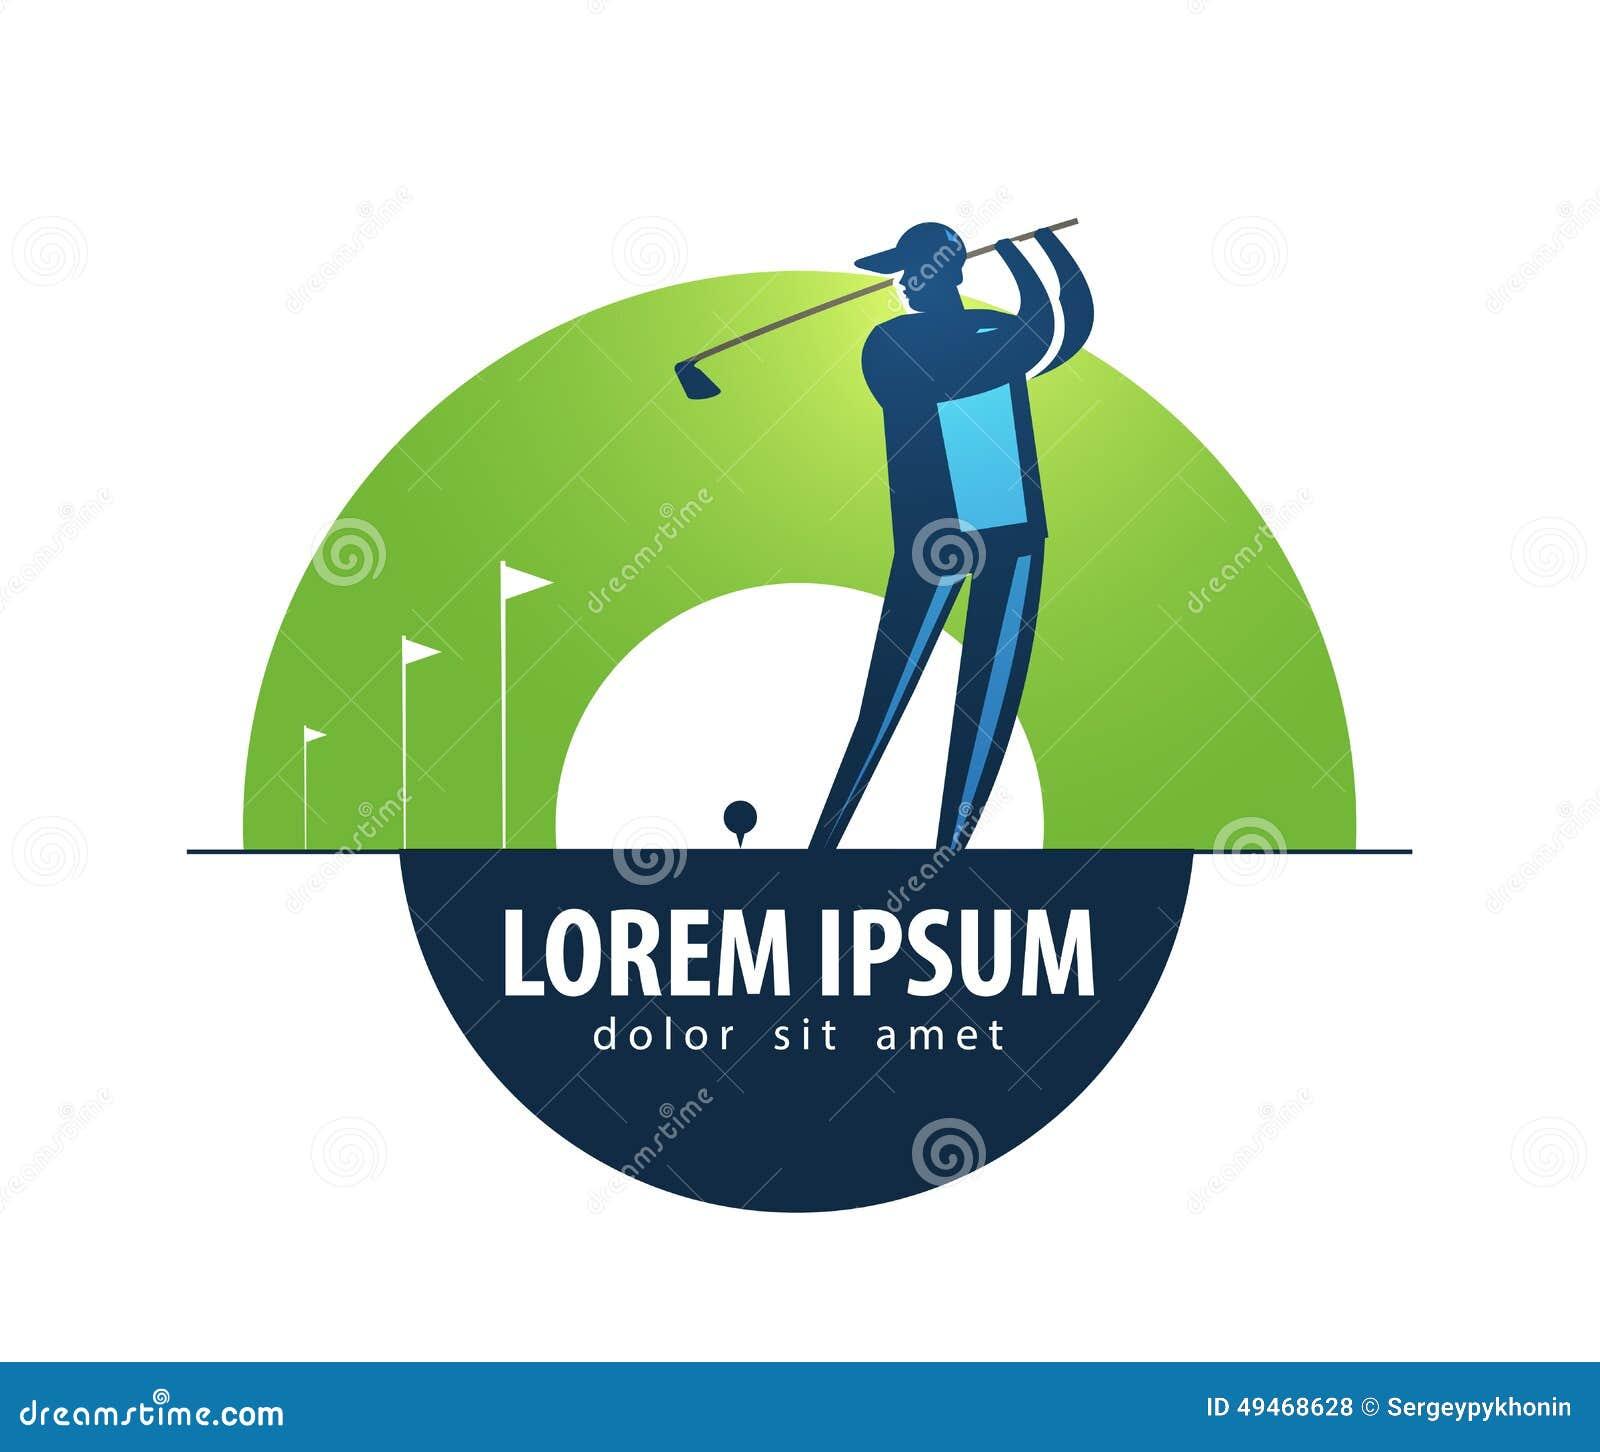 golf vector logo design template sports or game stock